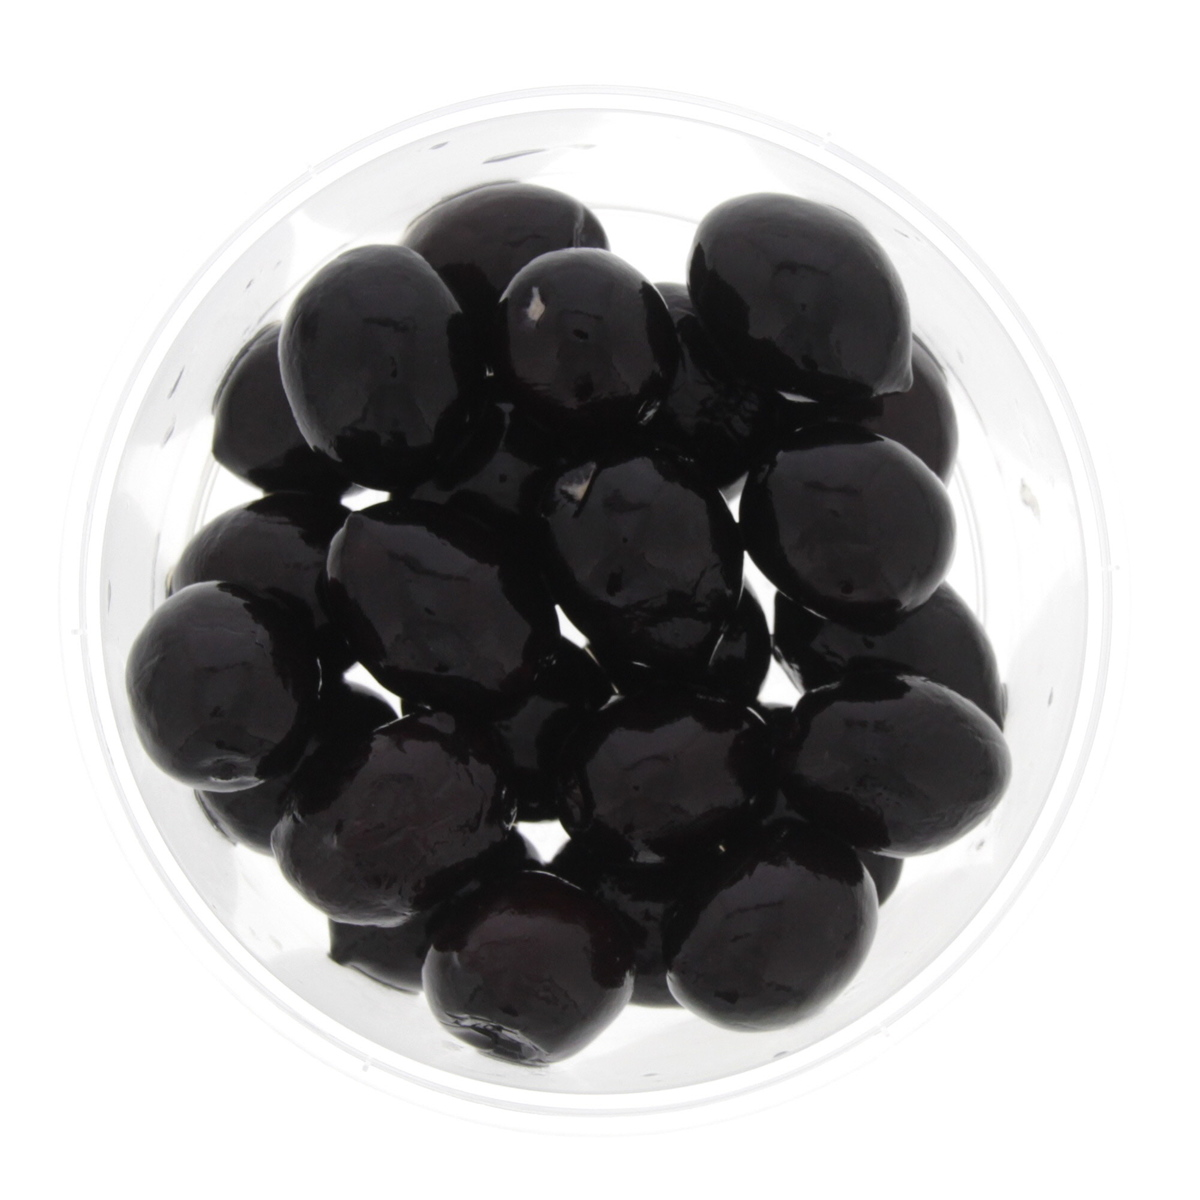 Buy Egyptian Jumbo Black Olives 300g - Middle East Olives